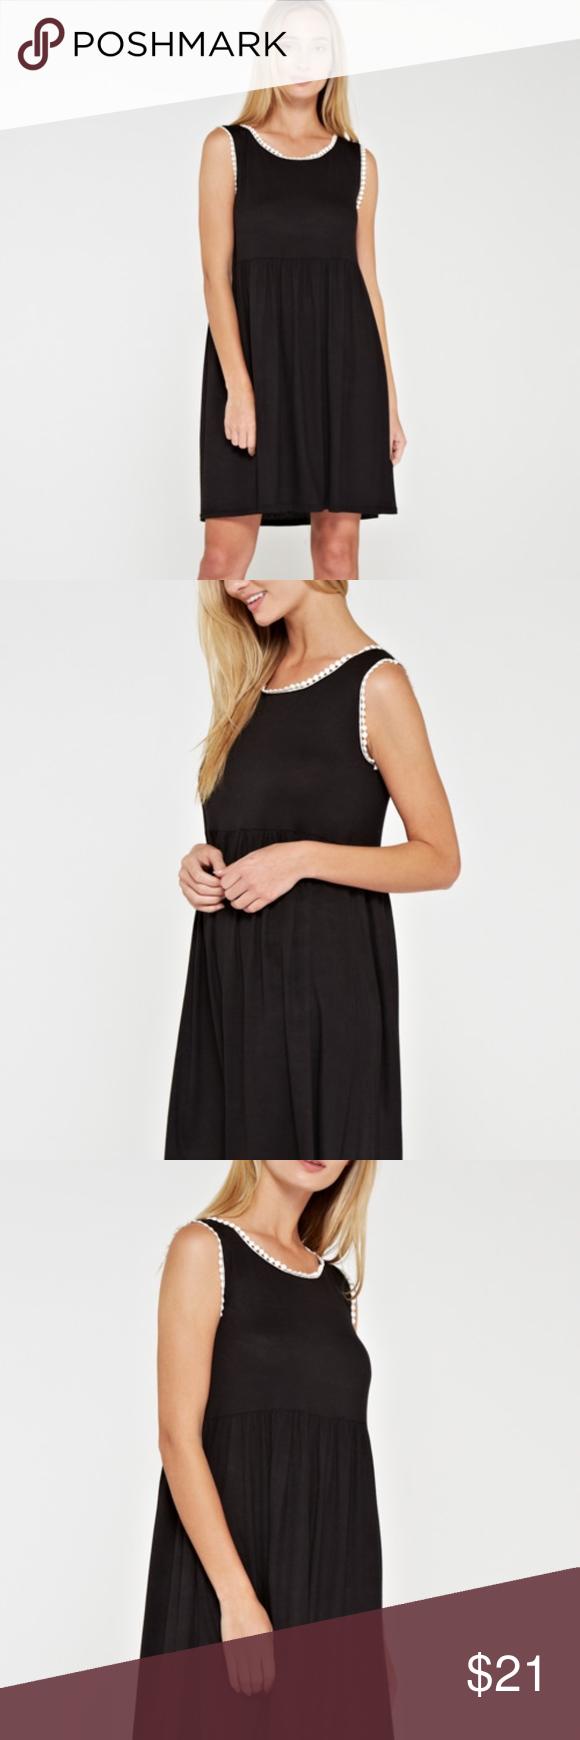 Black Mini Dress With White Trim Mini Black Dress Mini Dress Dresses [ 1740 x 580 Pixel ]